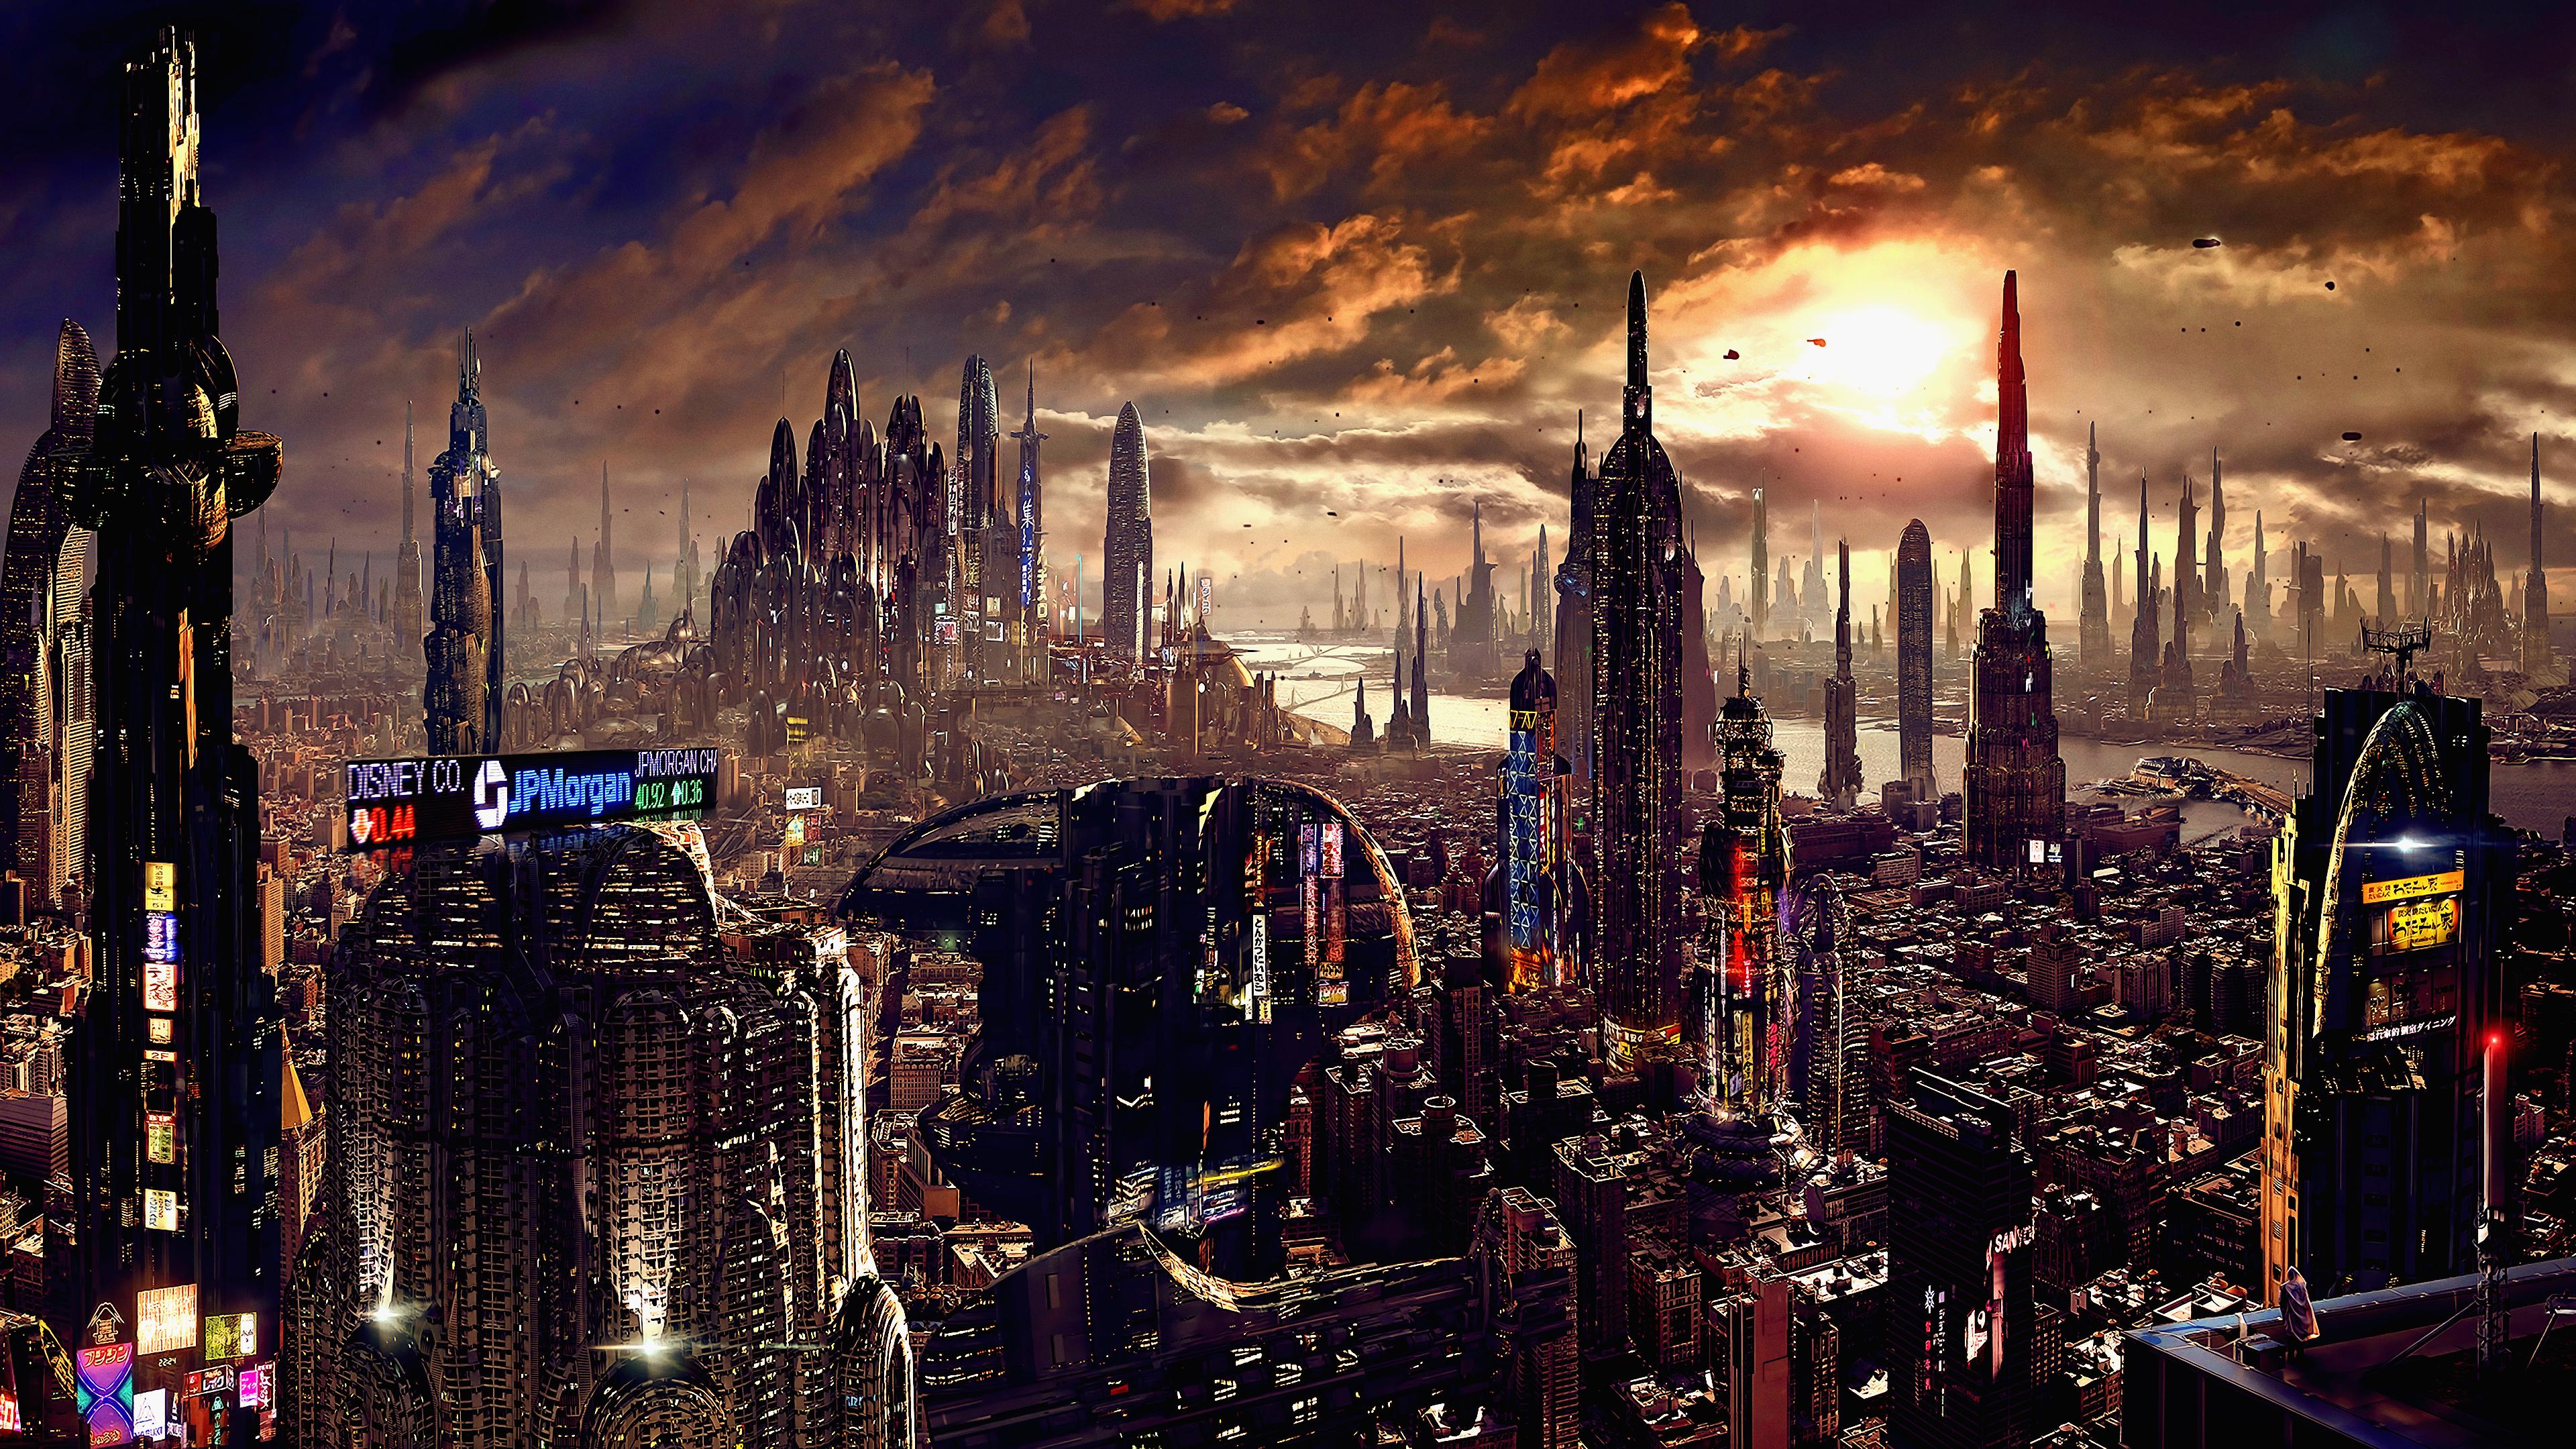 Wallpaper : artwork, futuristic city, science fiction ...